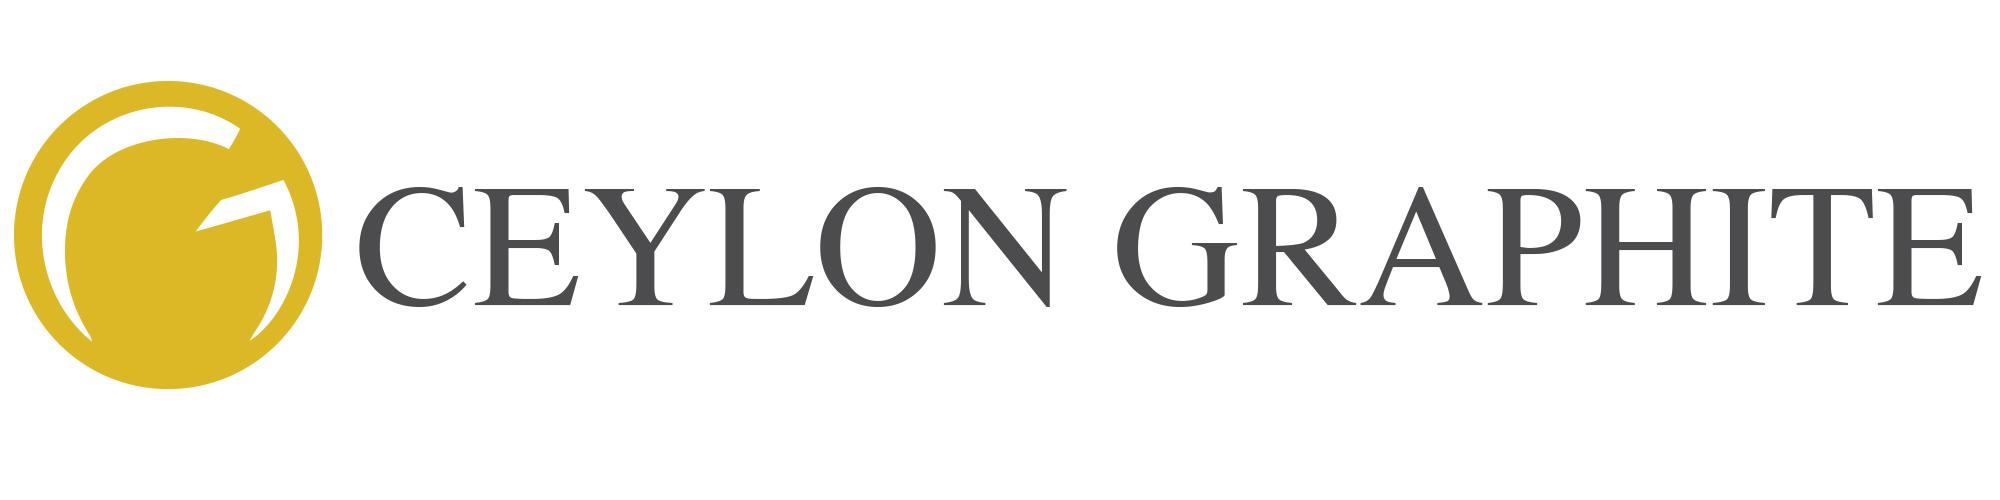 Ceylon Graphite Commences Expanded 2021 Drill Program